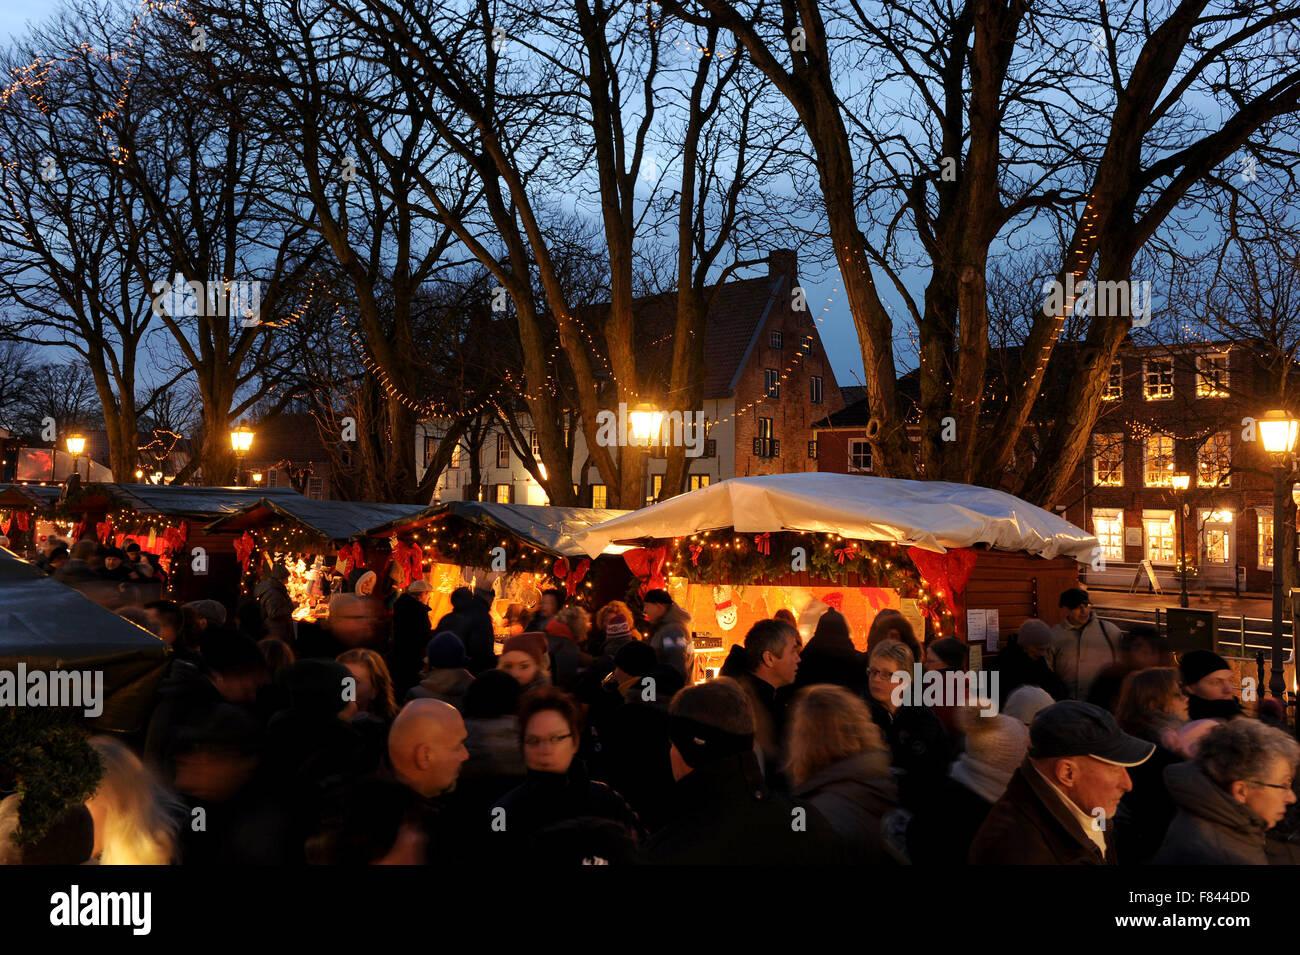 Weihnachtsmarkt Greetsiel.Greetsiel Germany 5th Dec 2015 Stockfotos Greetsiel Germany 5th